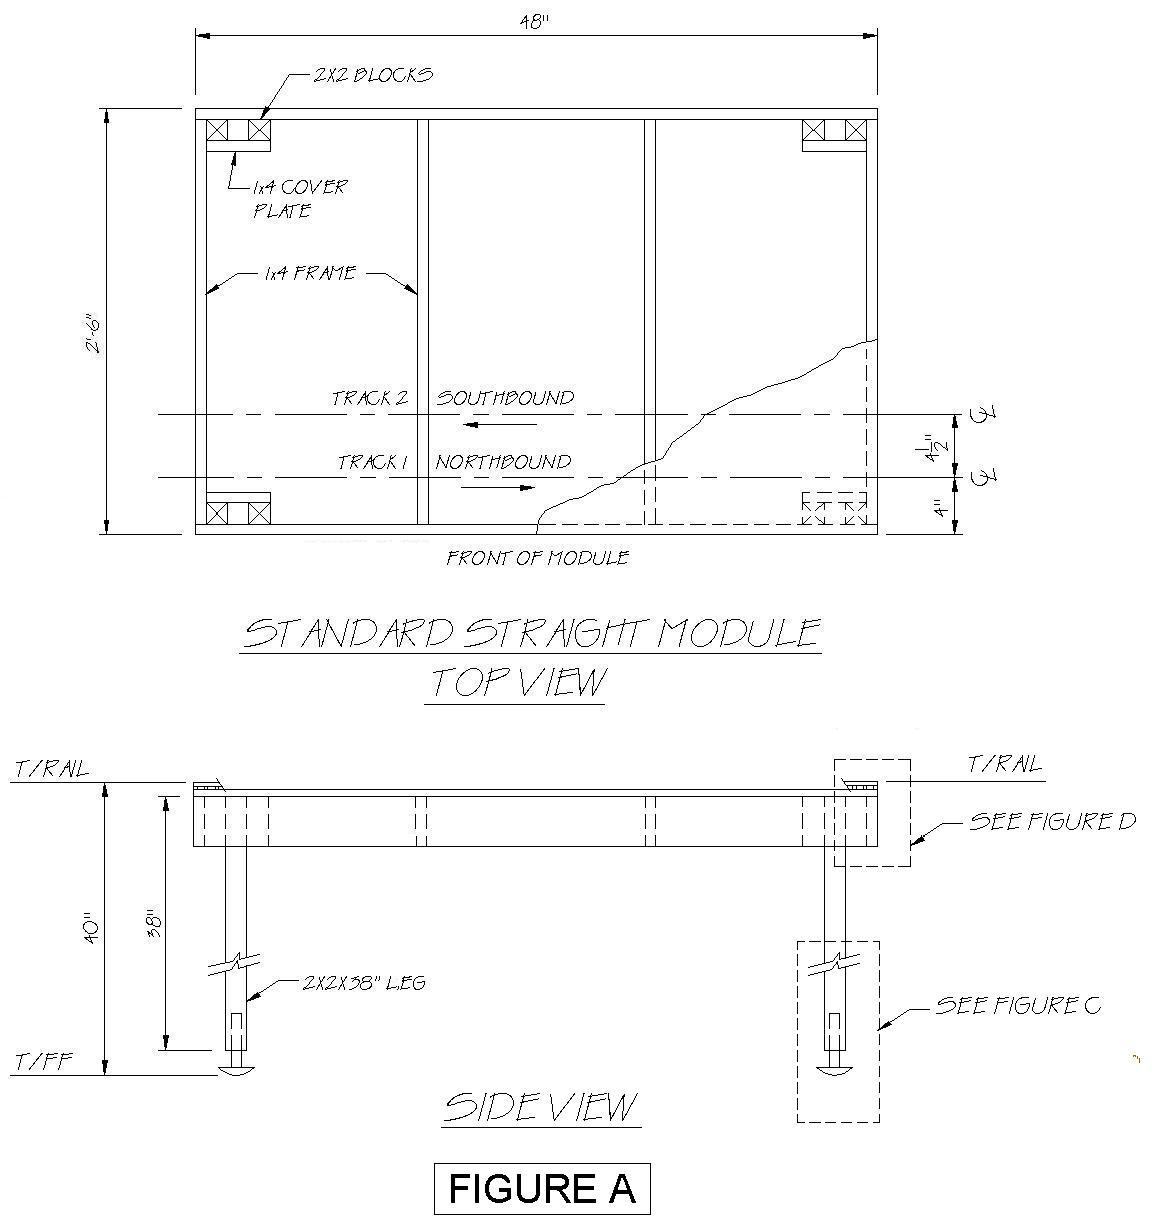 Htv Atlas Layout Wiring Diagram Alex Larkin Email Alexj42sflyercomcastnet